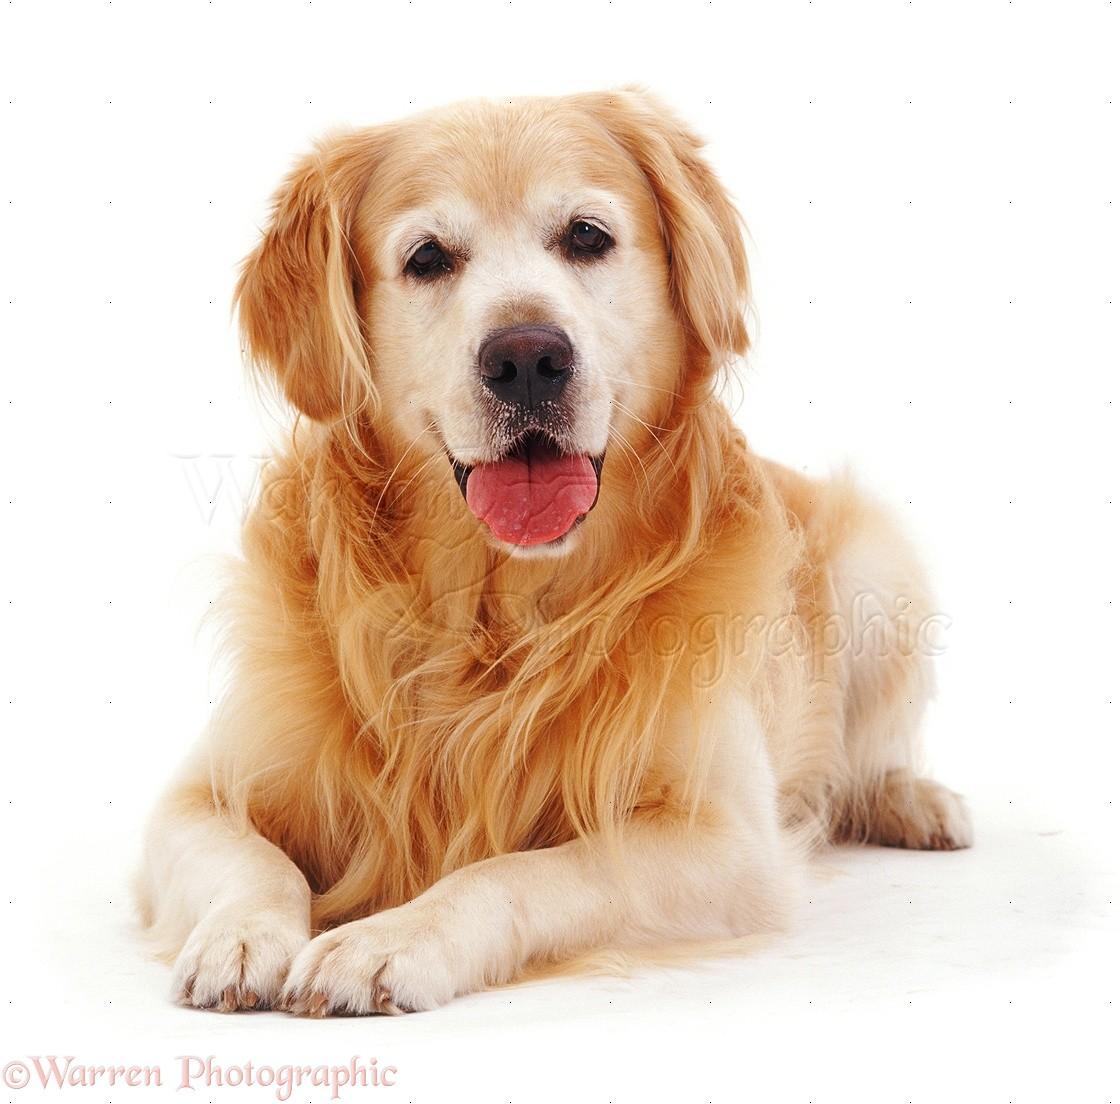 Wp08363 golden retriever dog teddy lying with head up